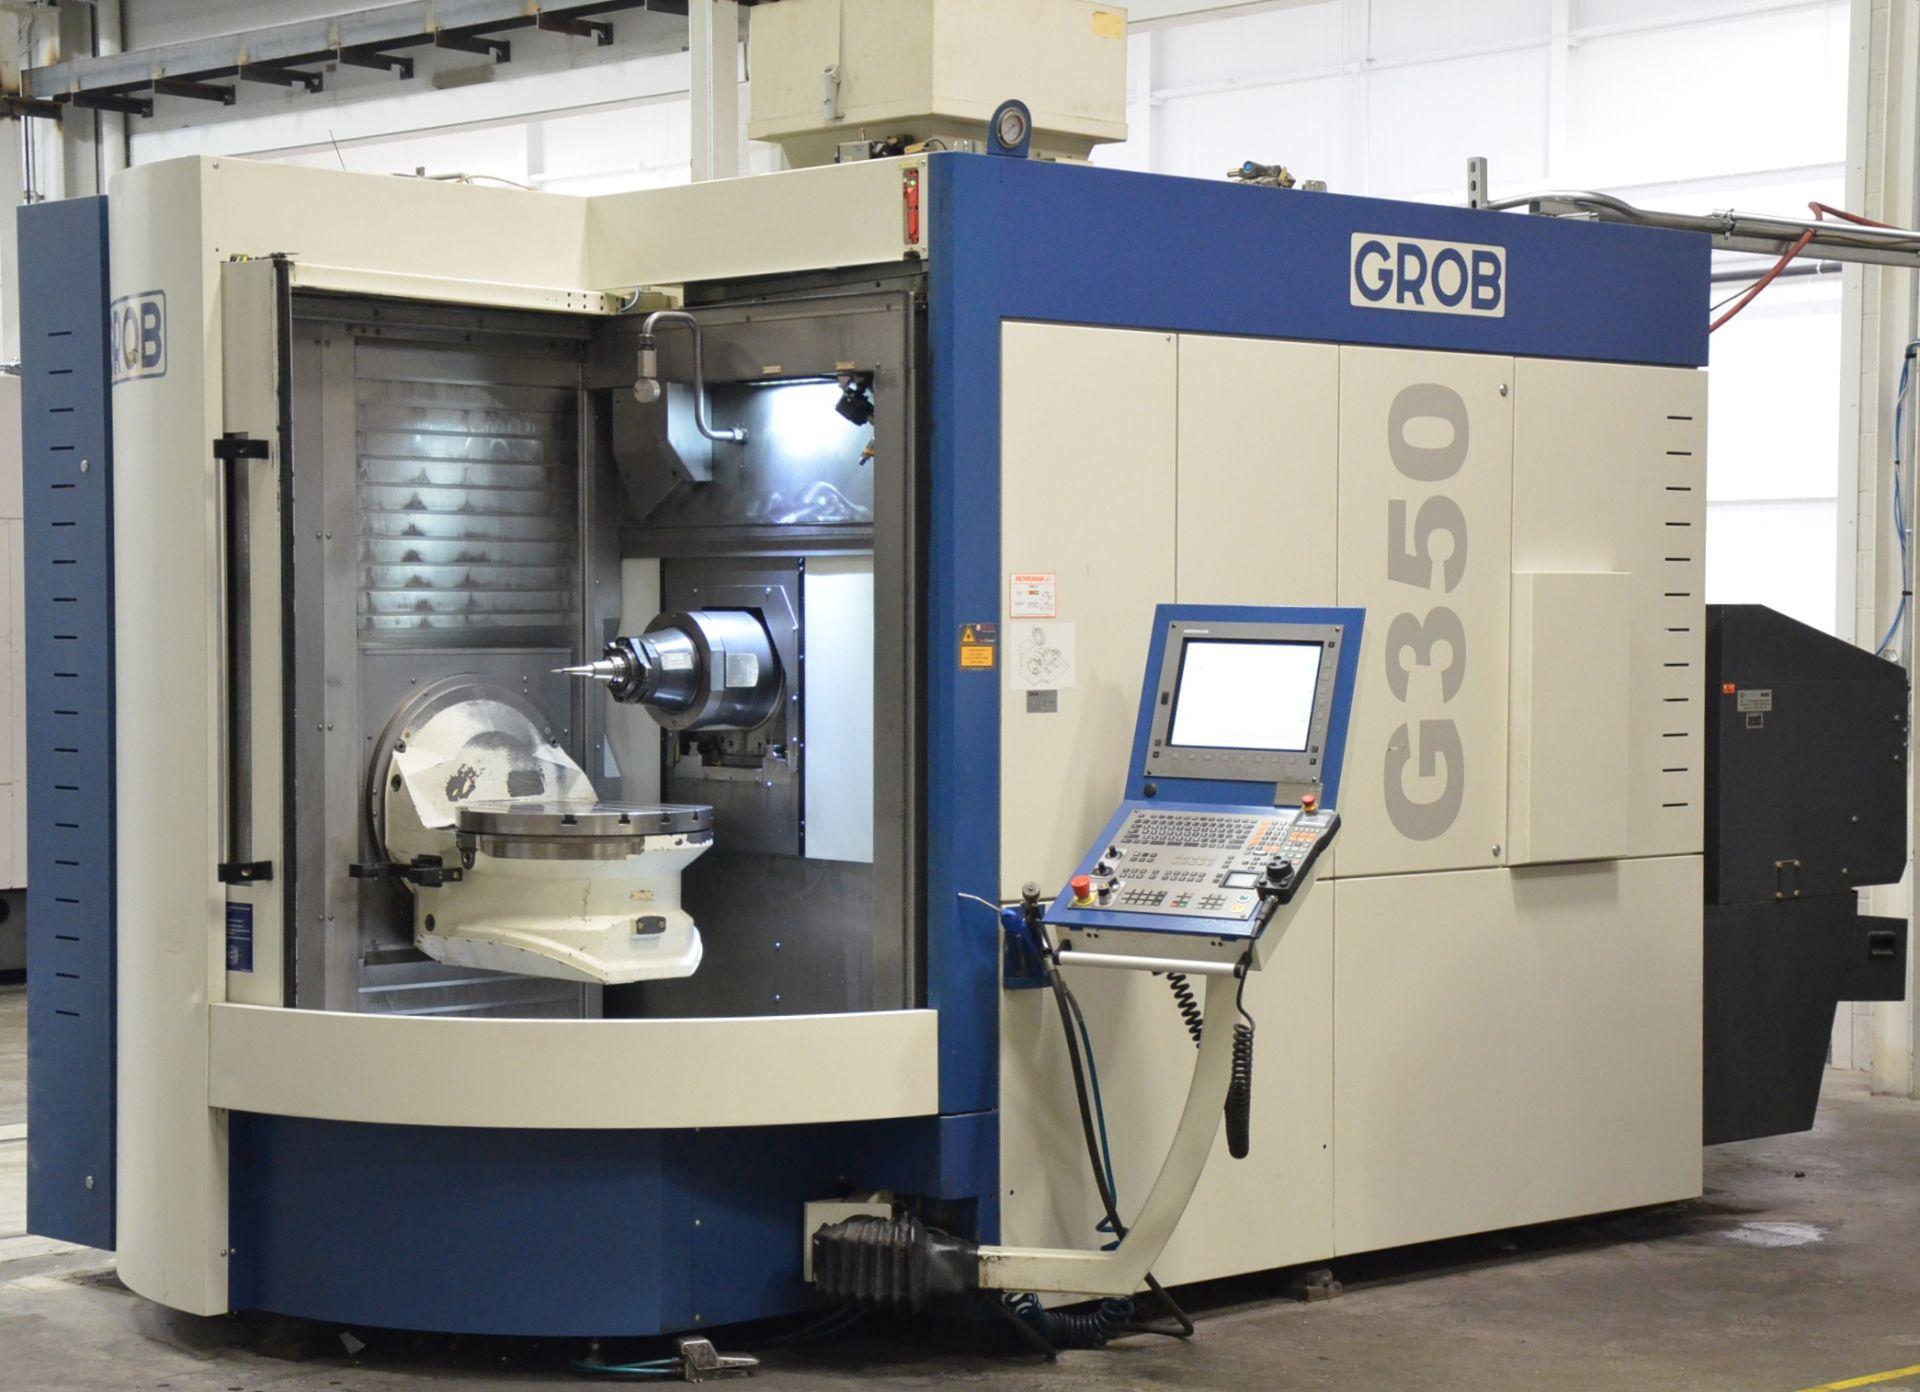 "GROB (2012) G350 5-AXIS CNC MACHINING CENTER WITH HEIDENHAIN ITNC 530 CNC CONTROL, 22.25"" DIAMETER"